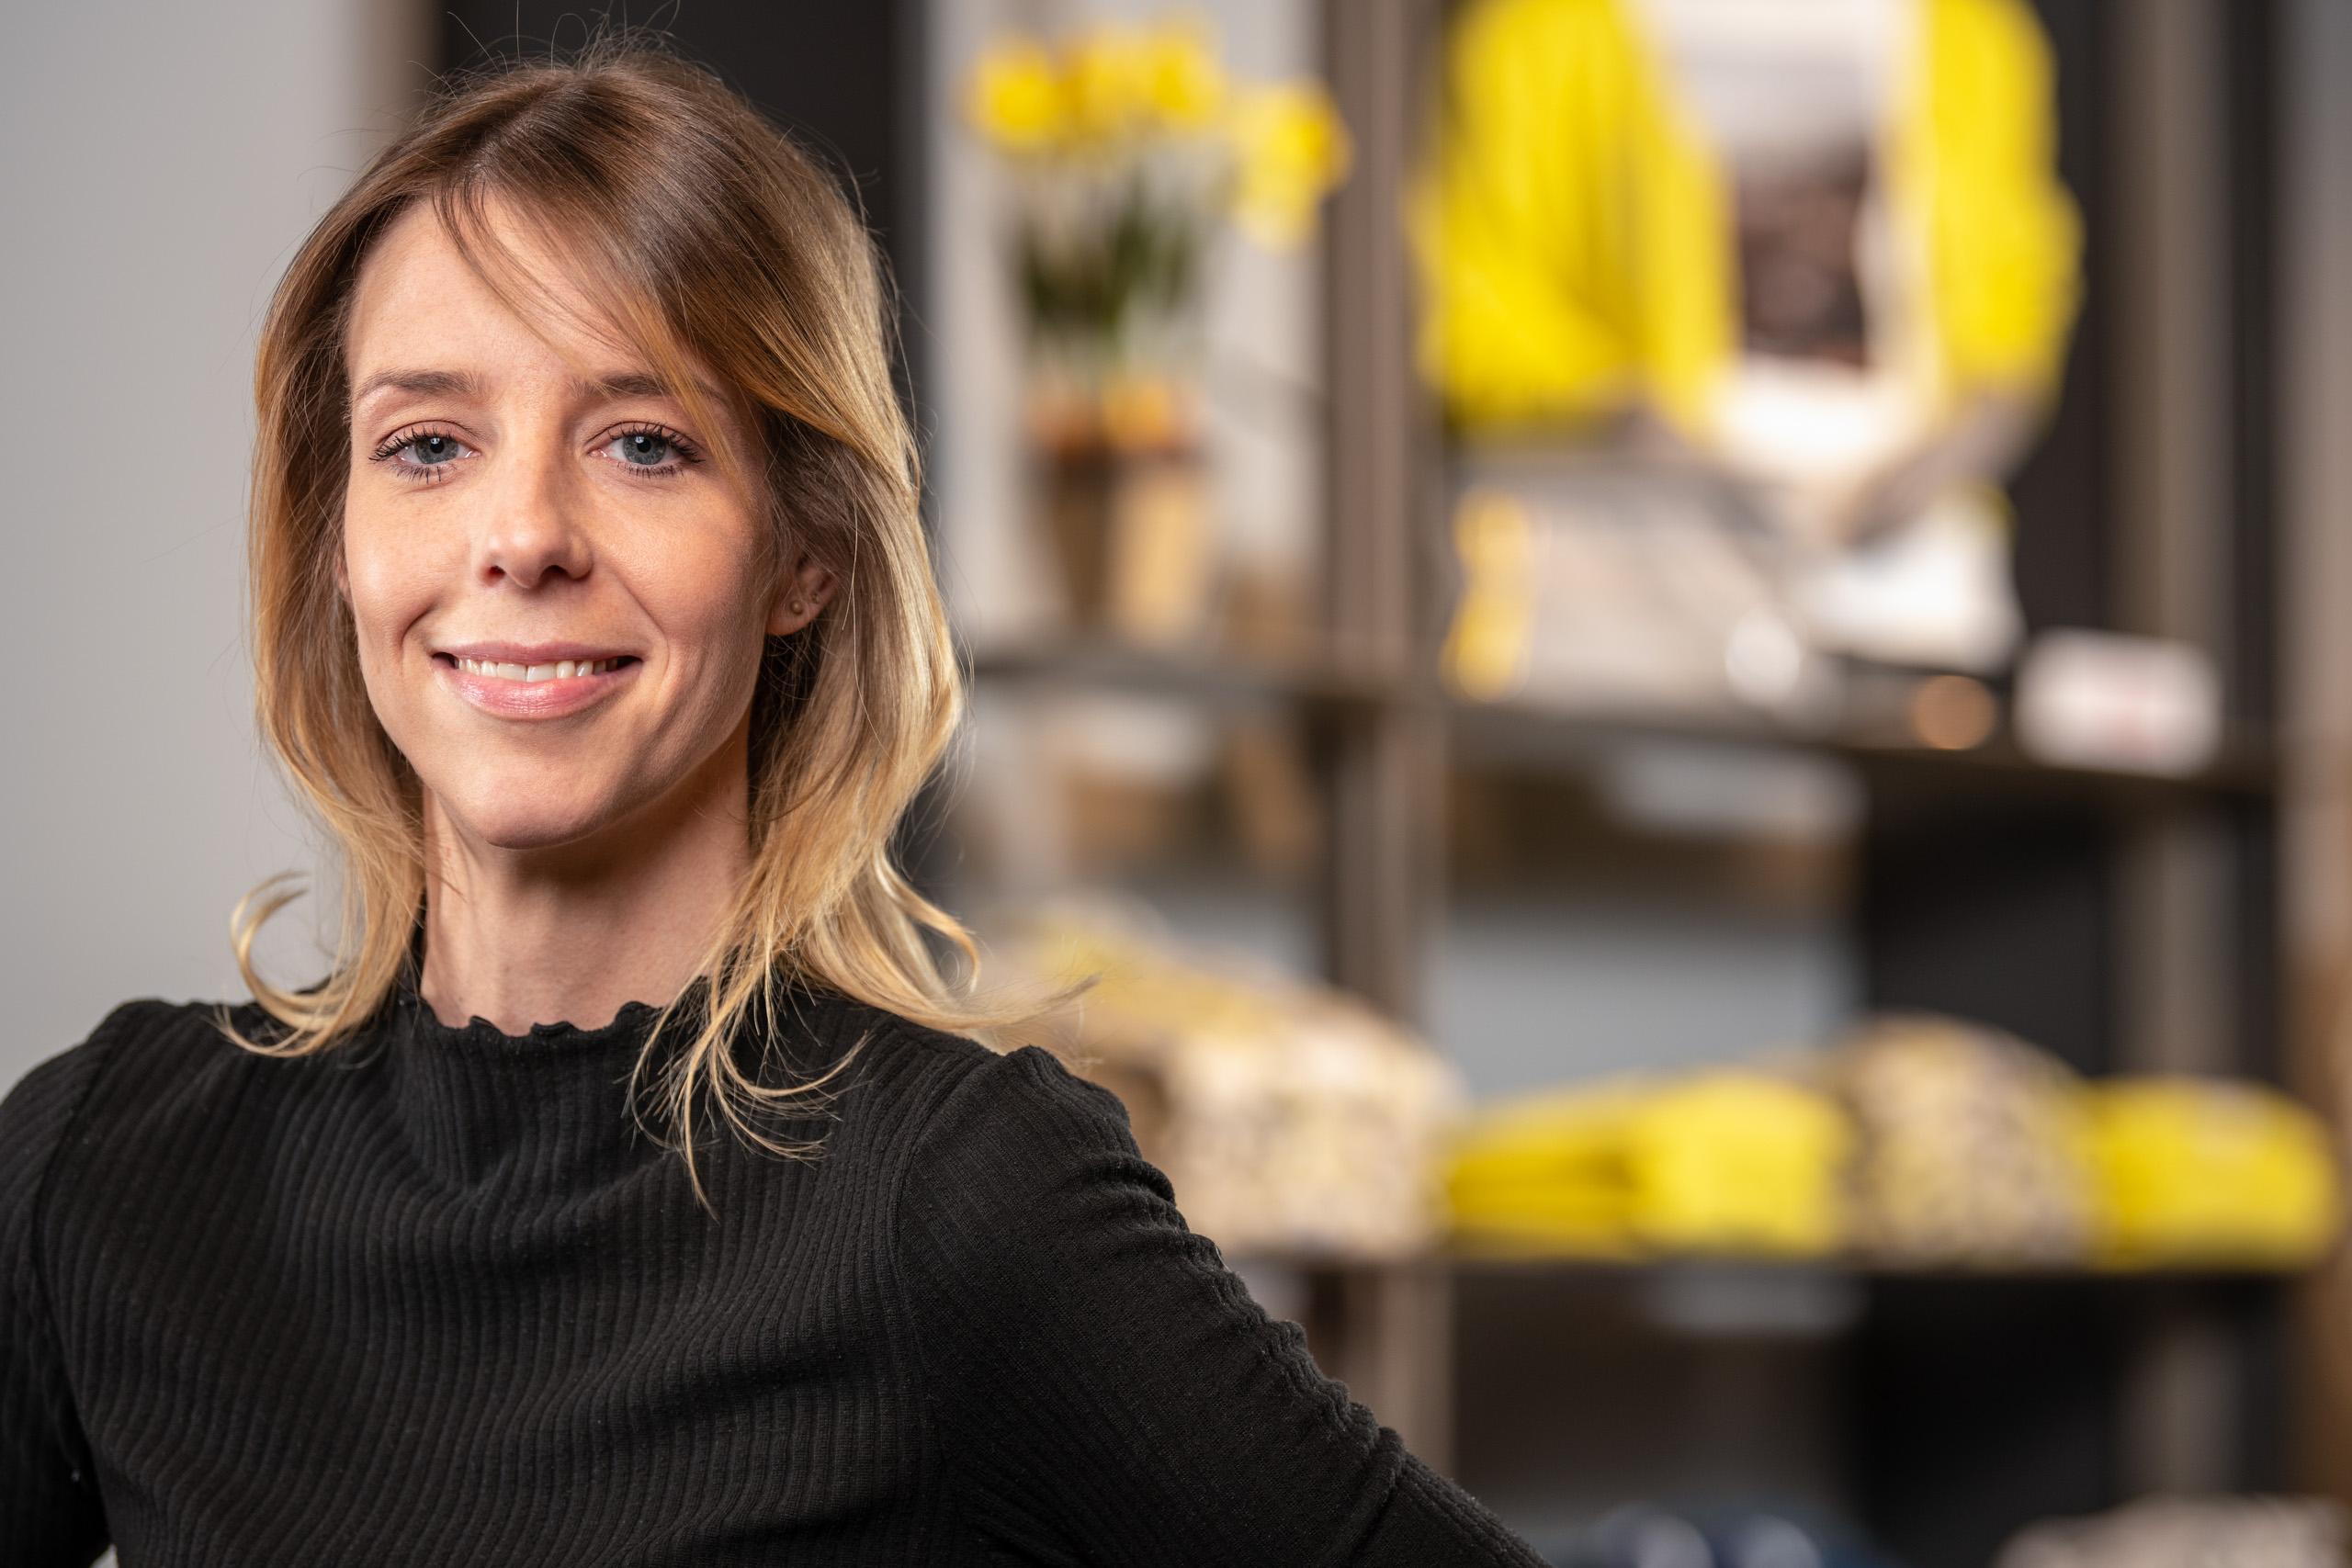 Carina Gullmann / Teamleiterin Herren